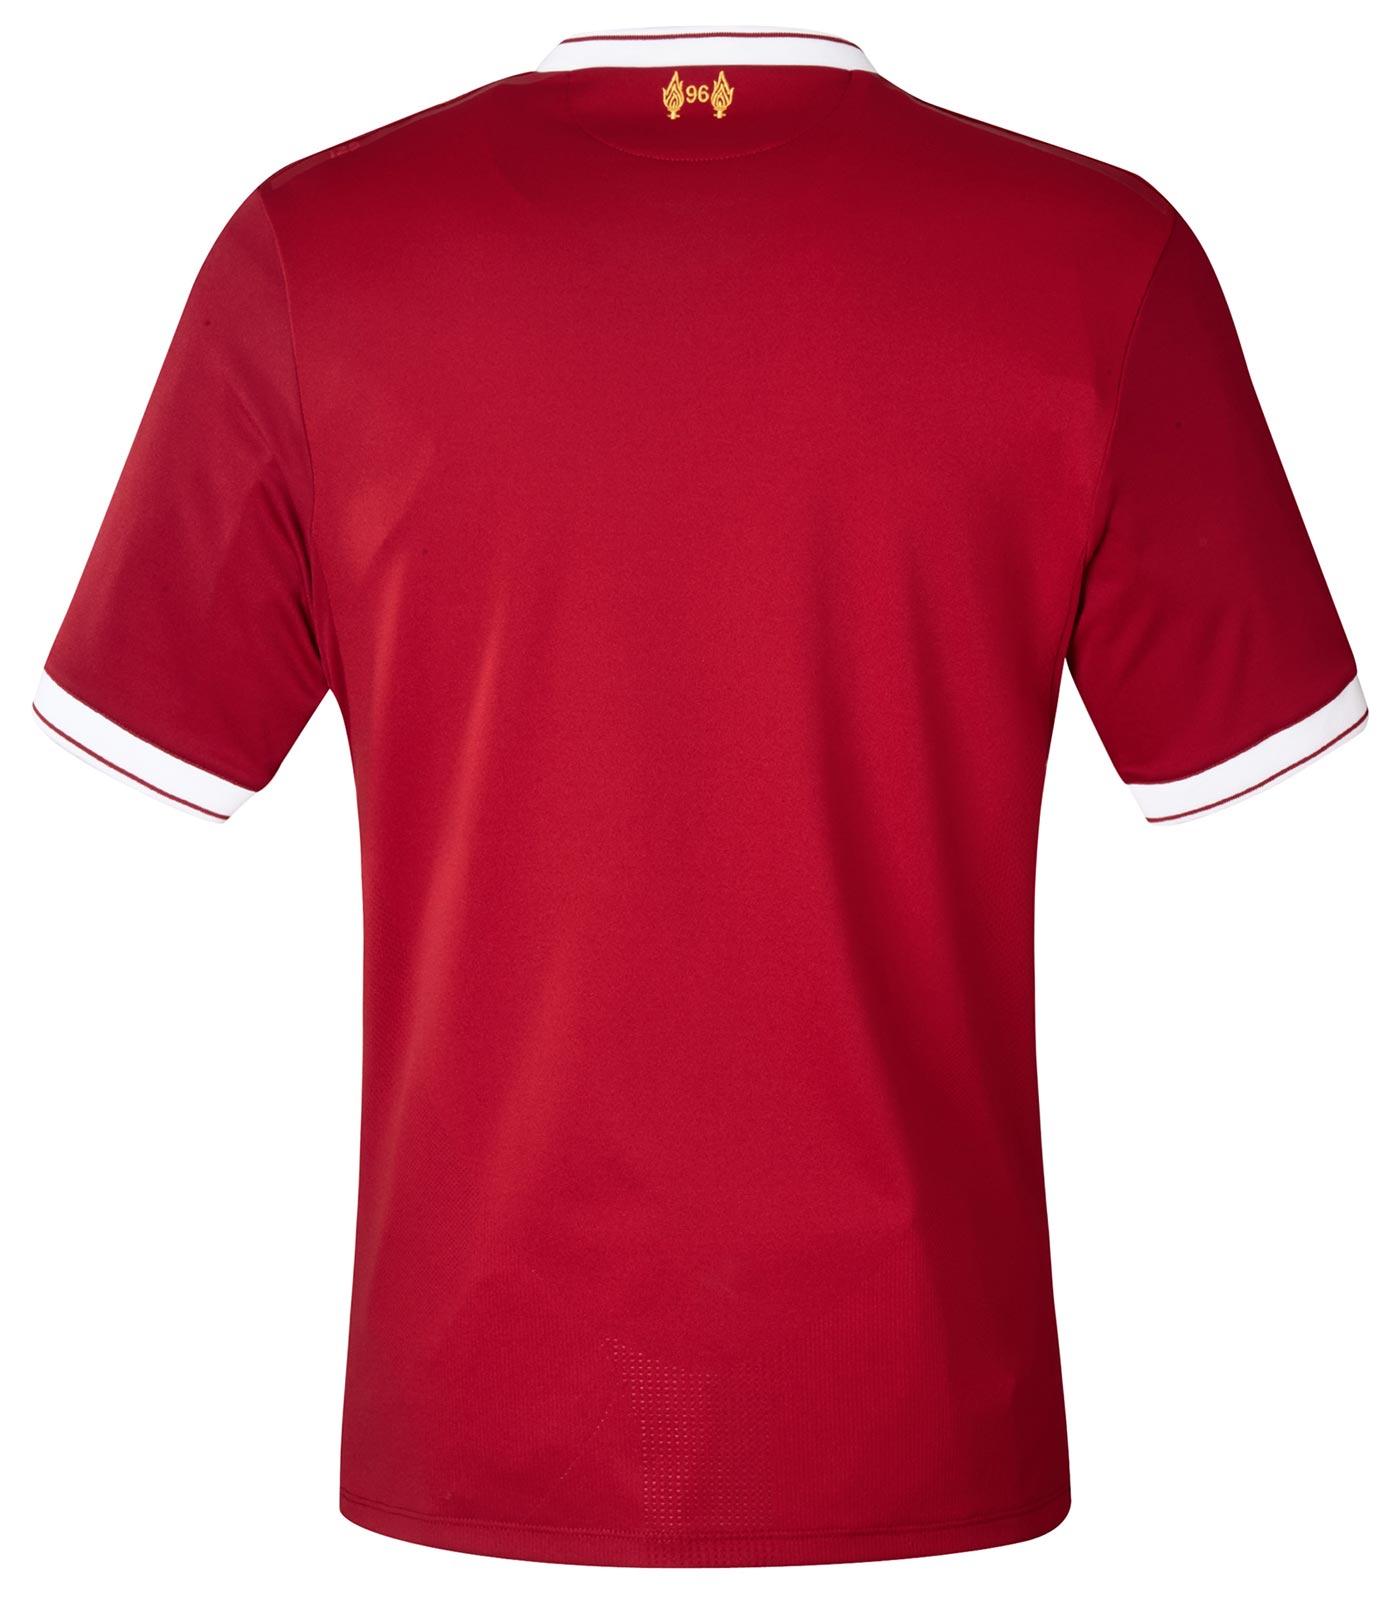 liverpool-17-18-home-kit-back